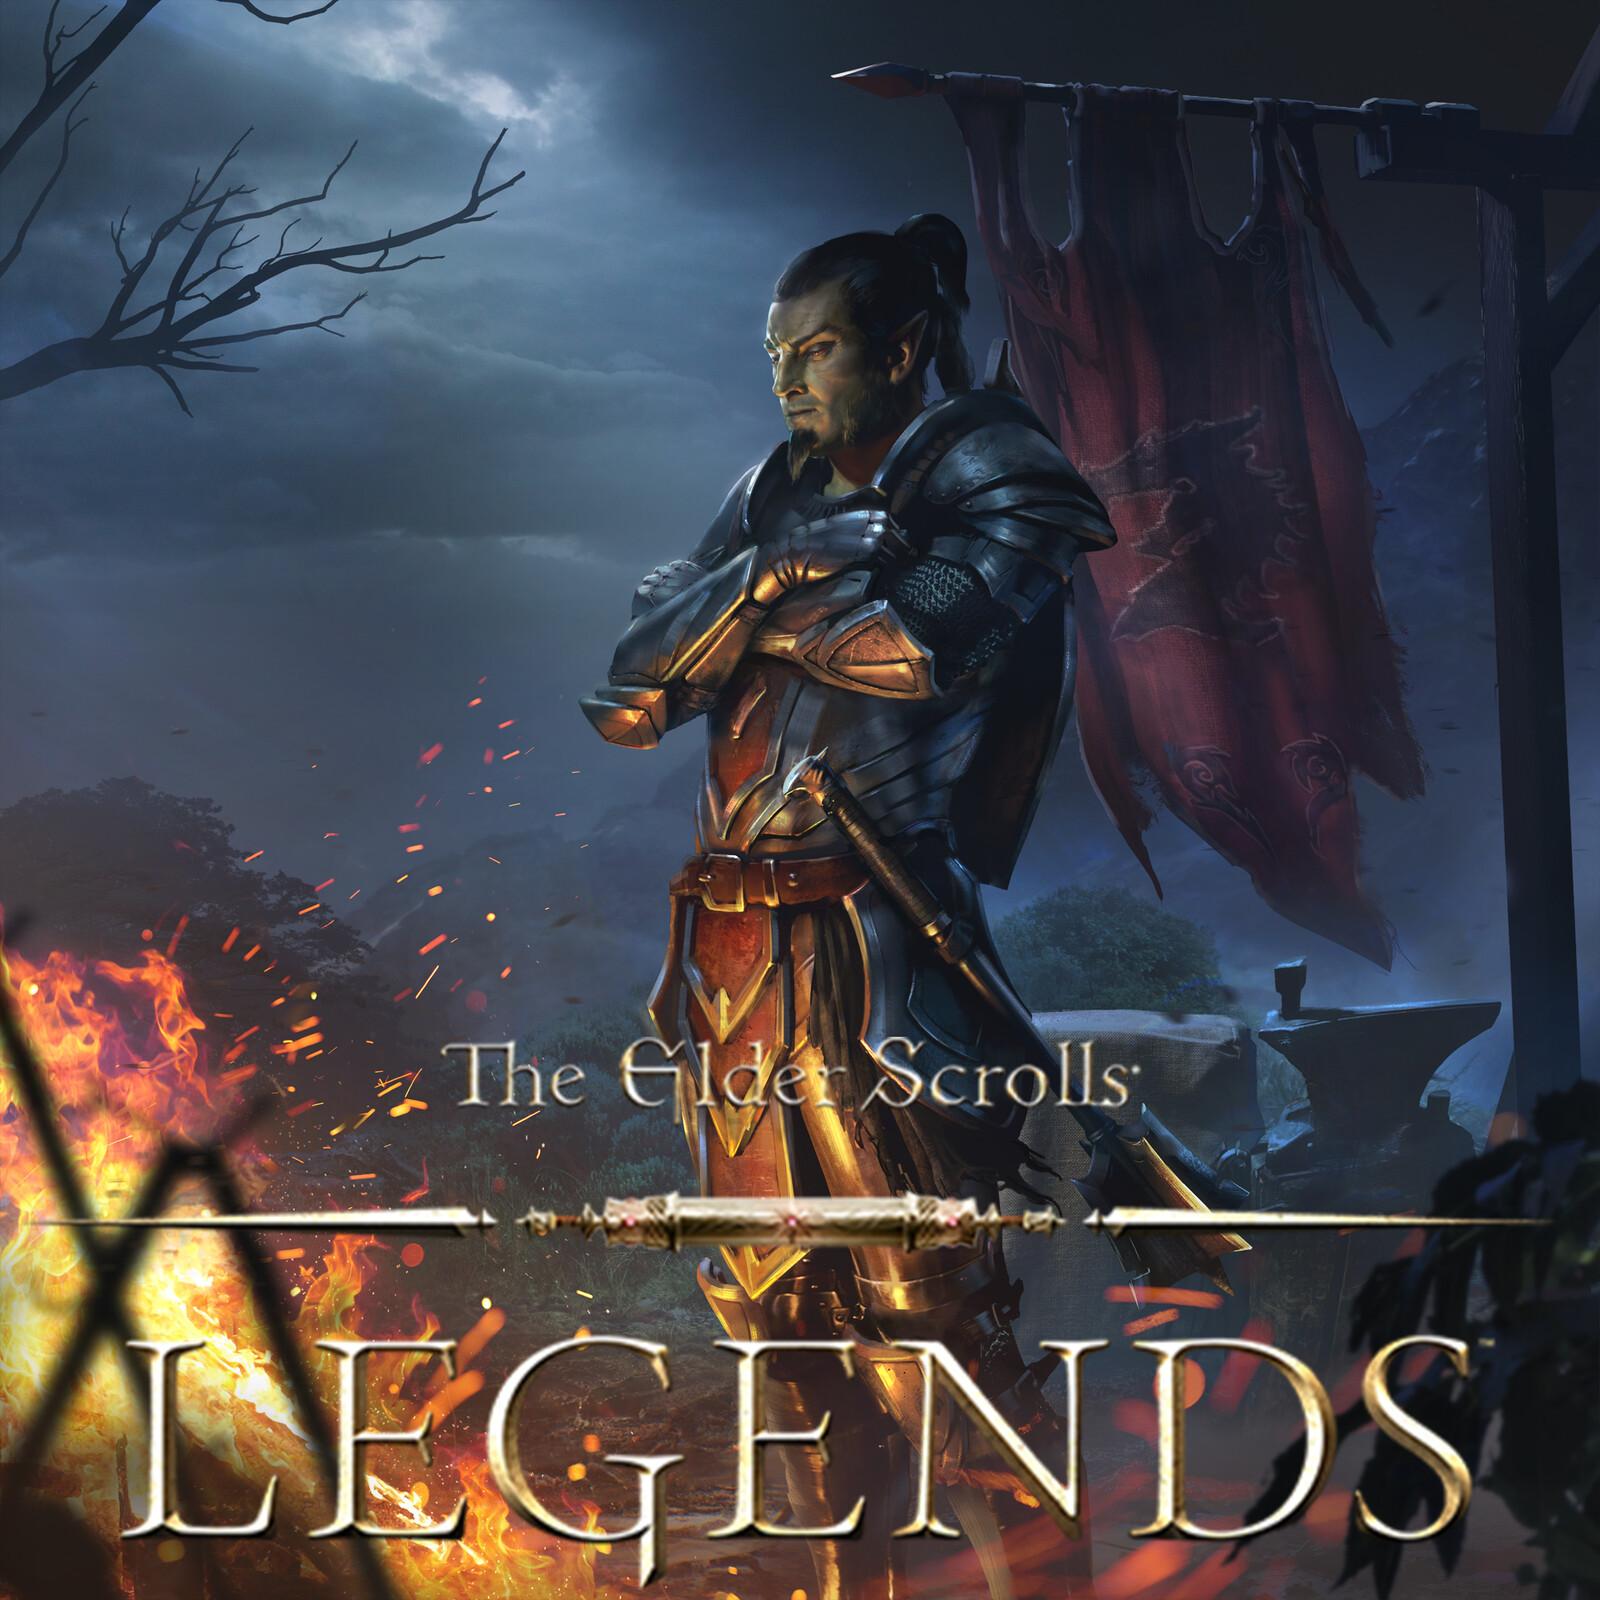 Forerunner of the Pact - The Elder Scrolls: Legends